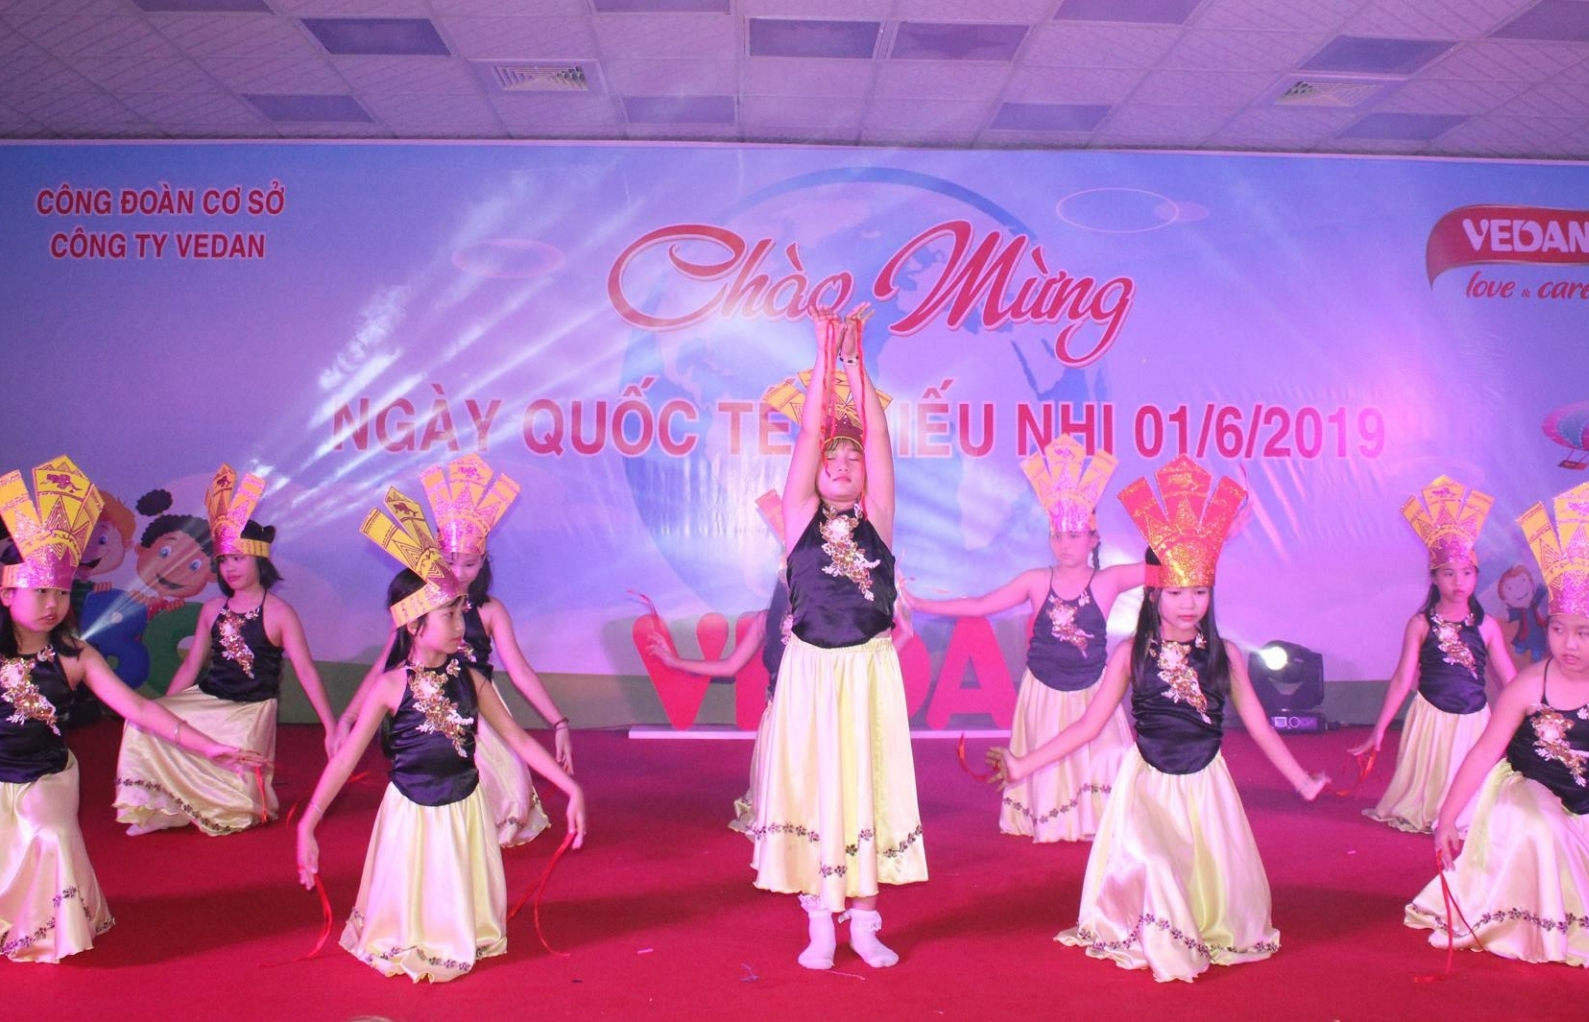 How International Children's Day is celebrated in Vietnam